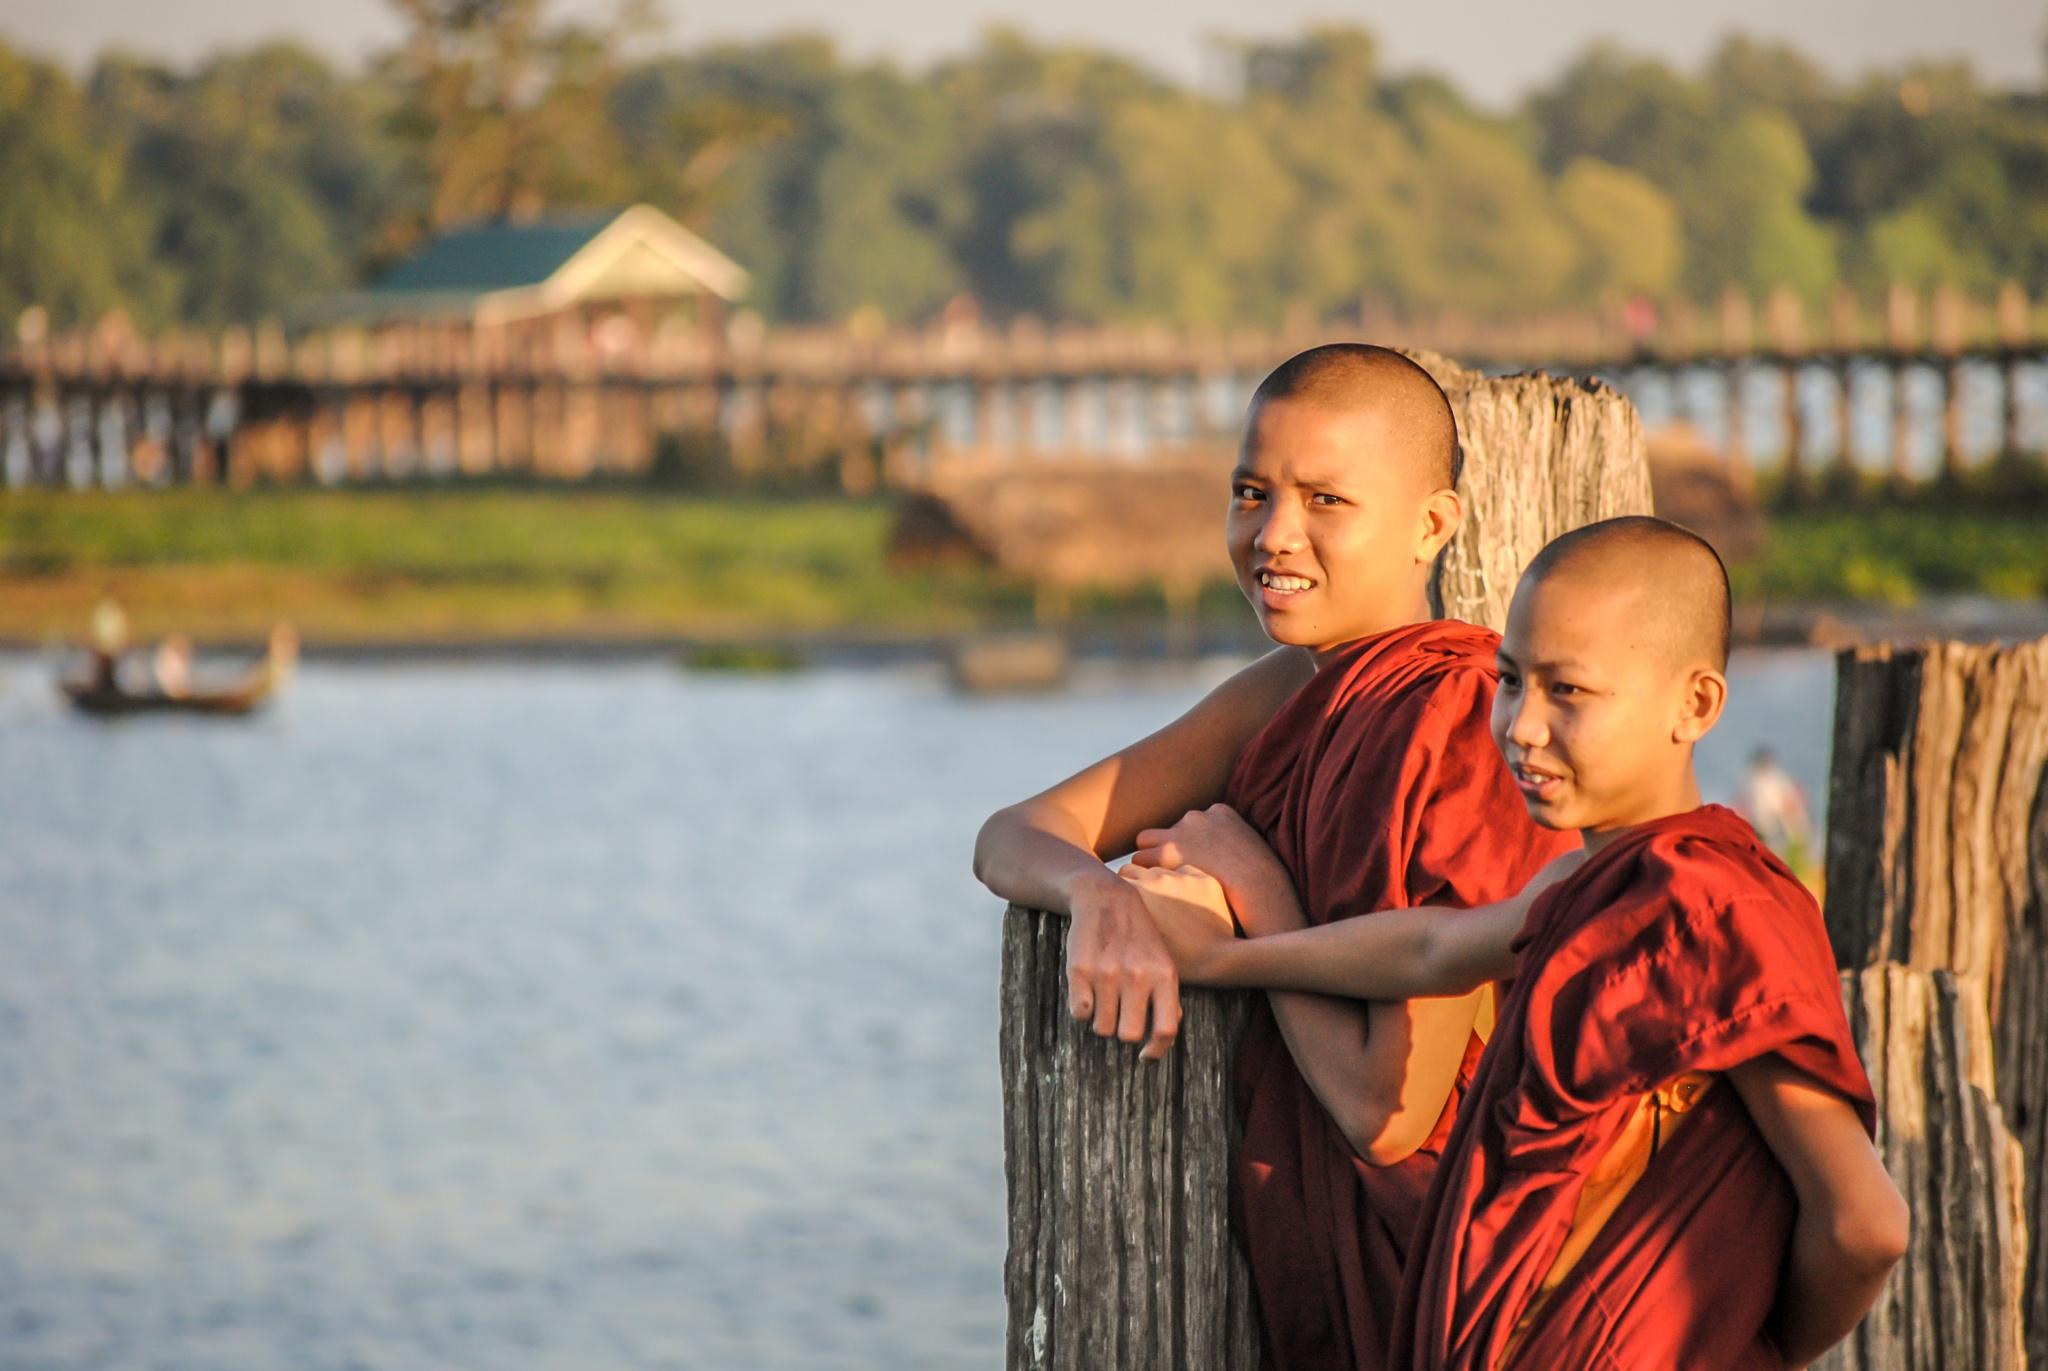 Monks on U Bein Bridge - Myanmar by Chamkhi Jamil